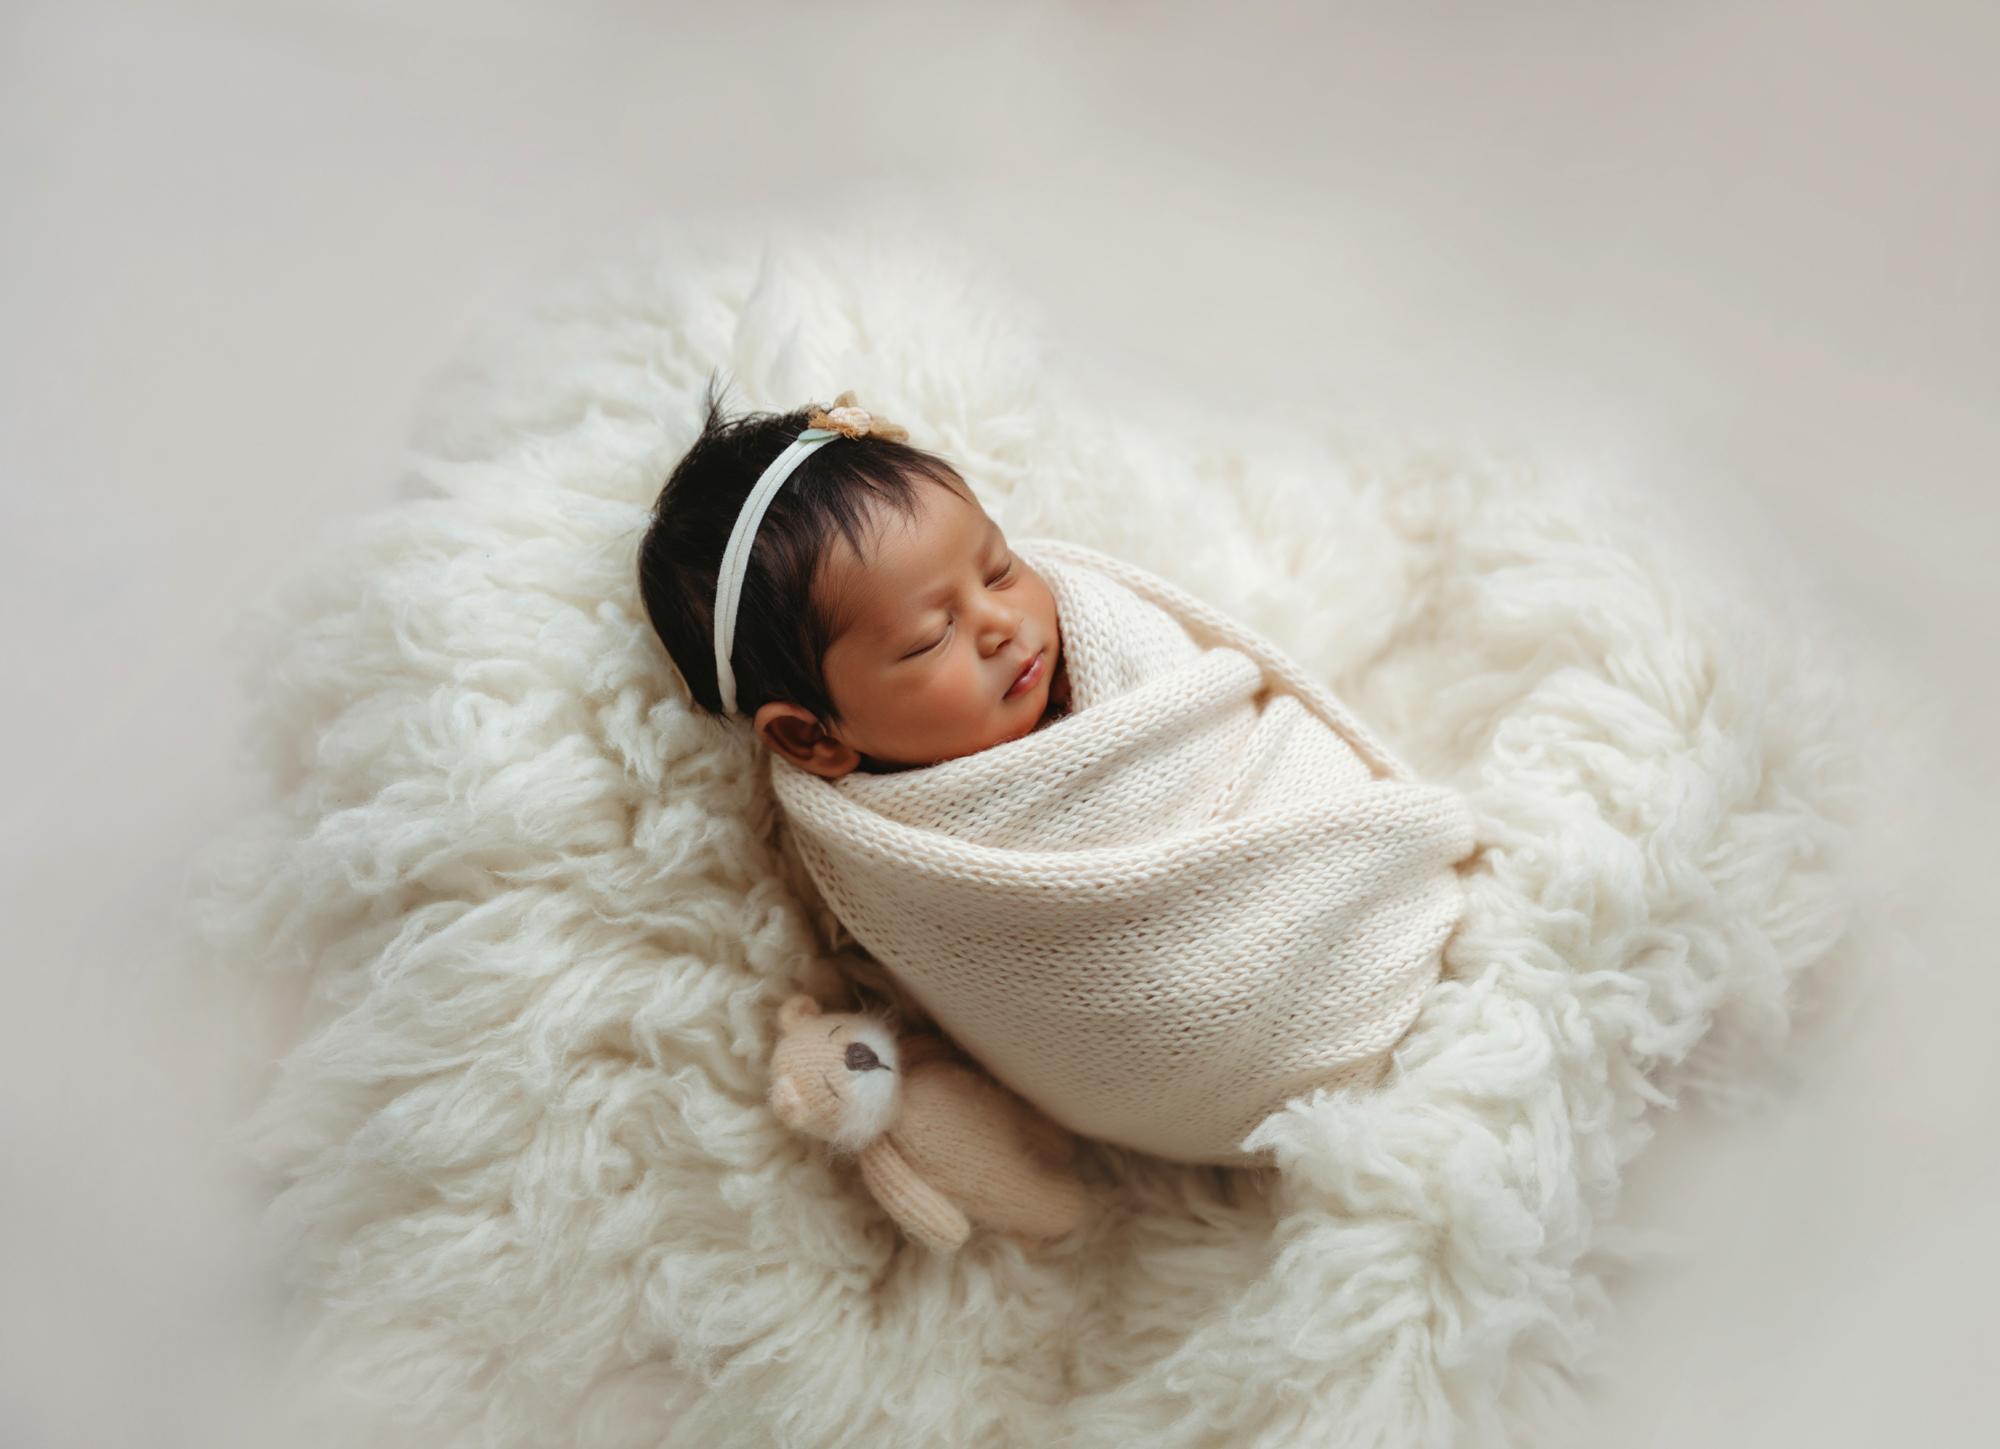 Newborn portrait of baby in white knit wrap on flokati